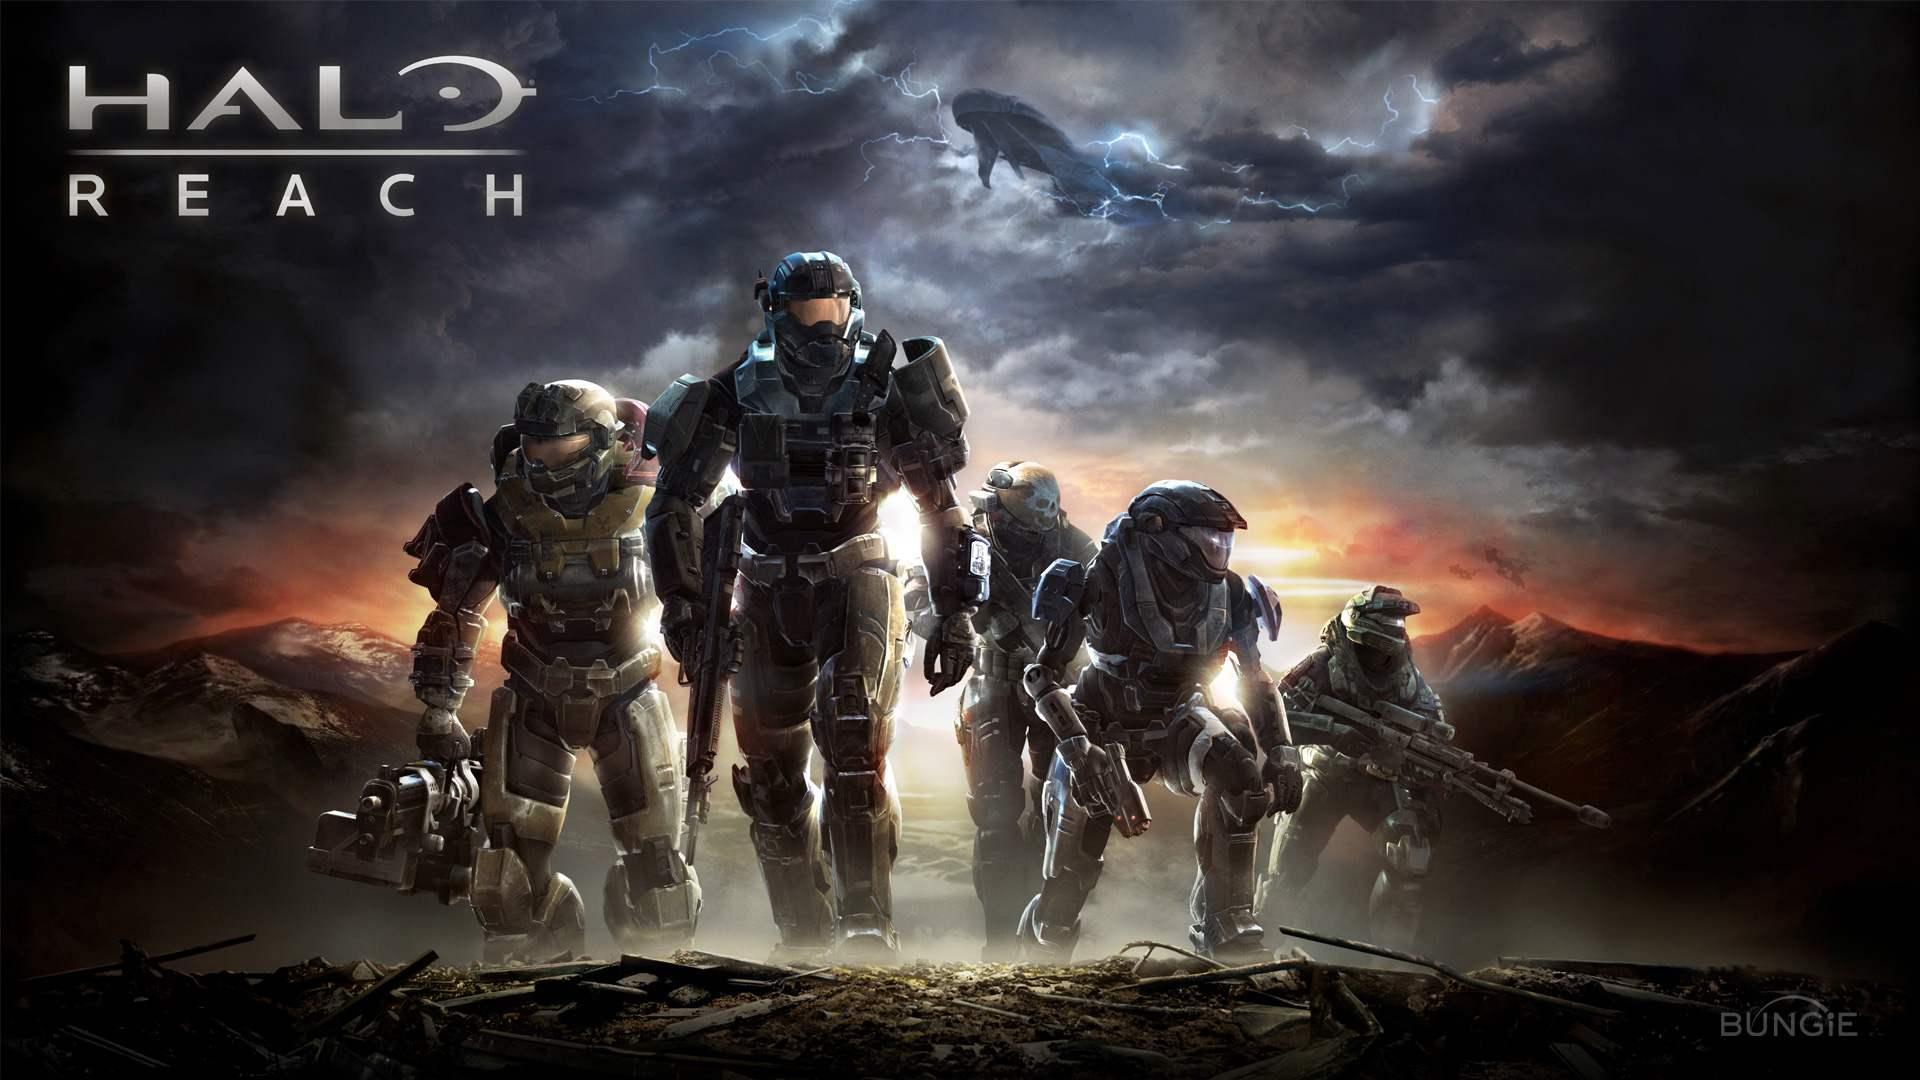 Halo Reach 1080p Wallpaper Halo Reach 720p Wallpaper 1920x1080